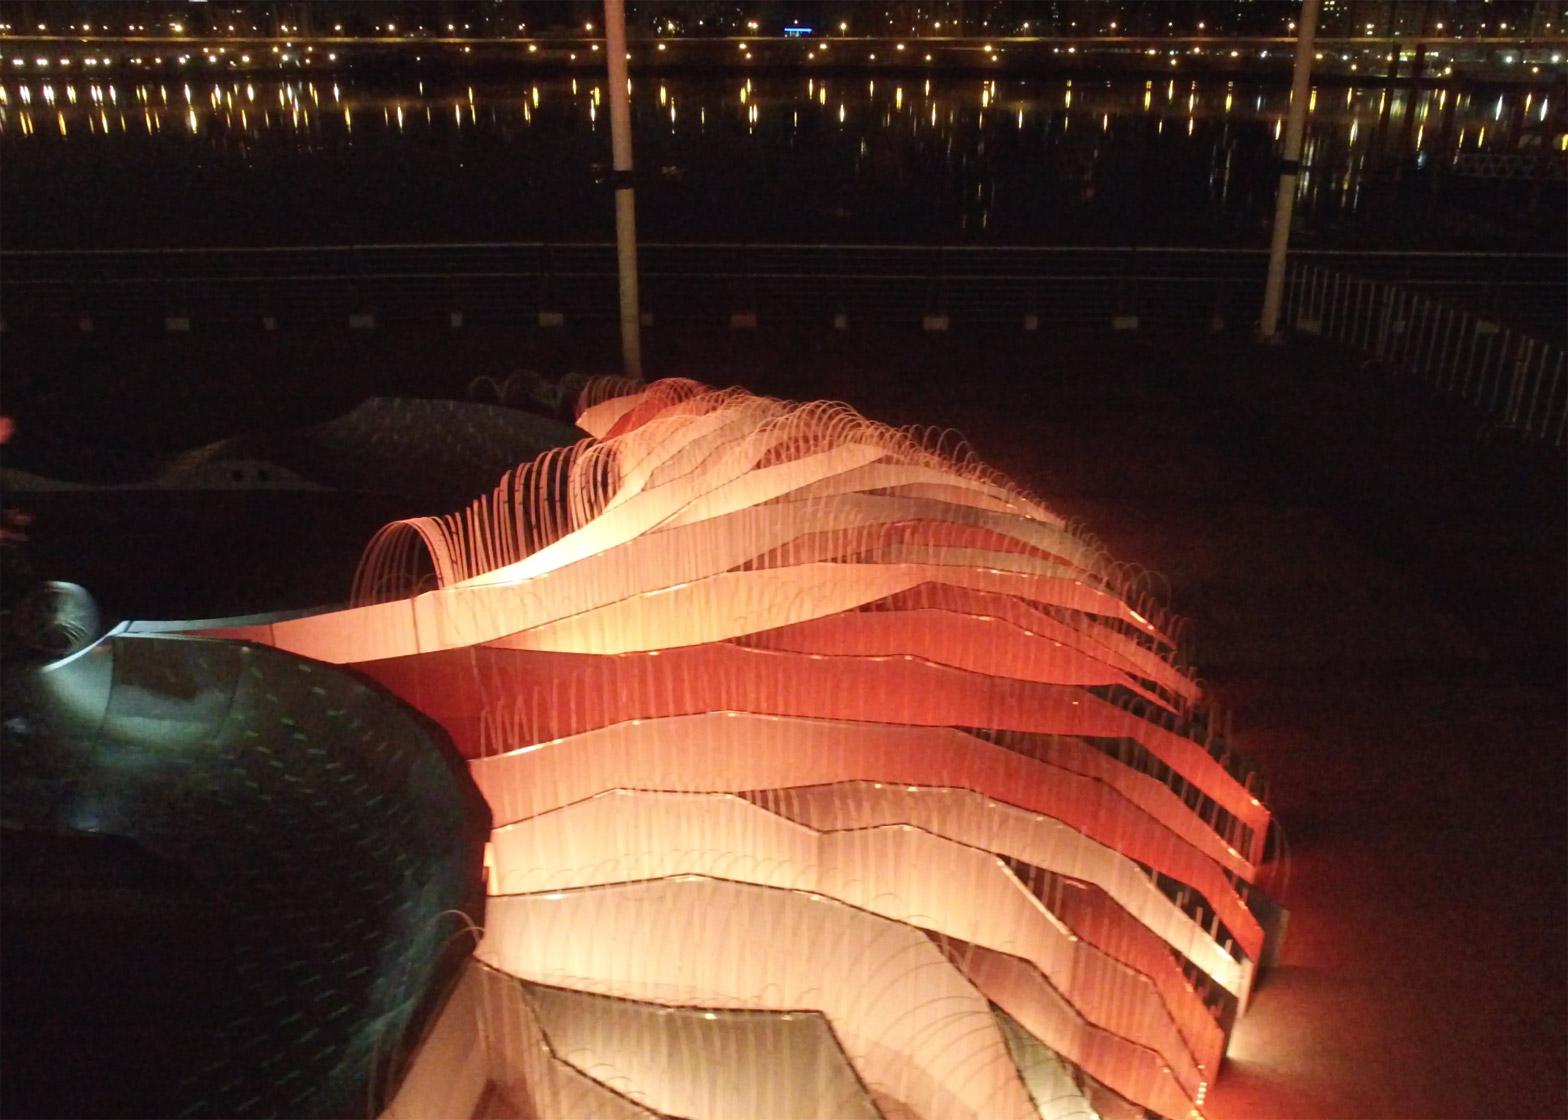 velo2-loop-ph-shin-kong-life-architecture-cycling-light-installation-taipei-taiwan_dezeen_1568_25